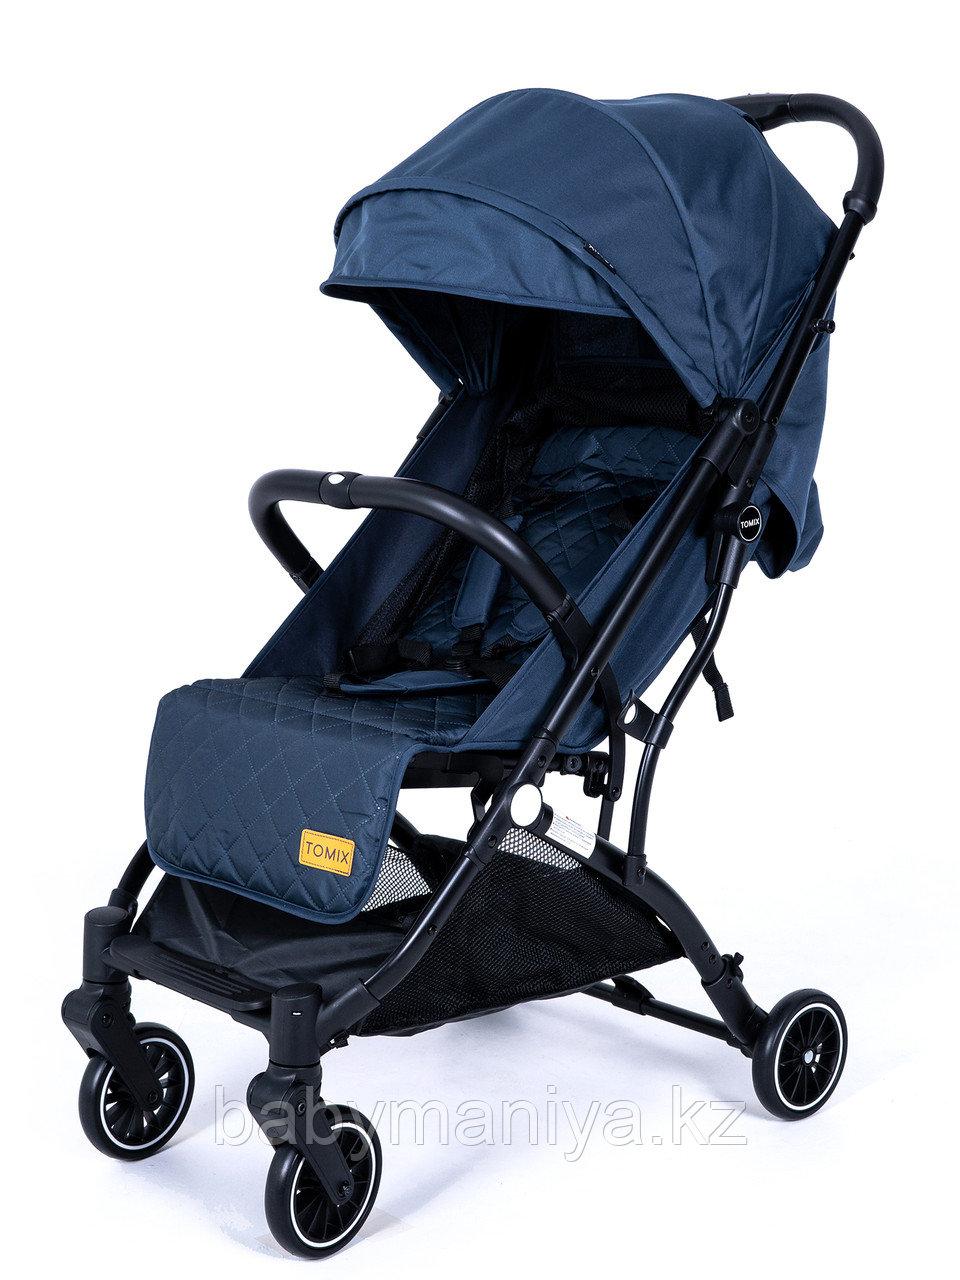 Прогулочная коляска Tomix LUNA (Blue)